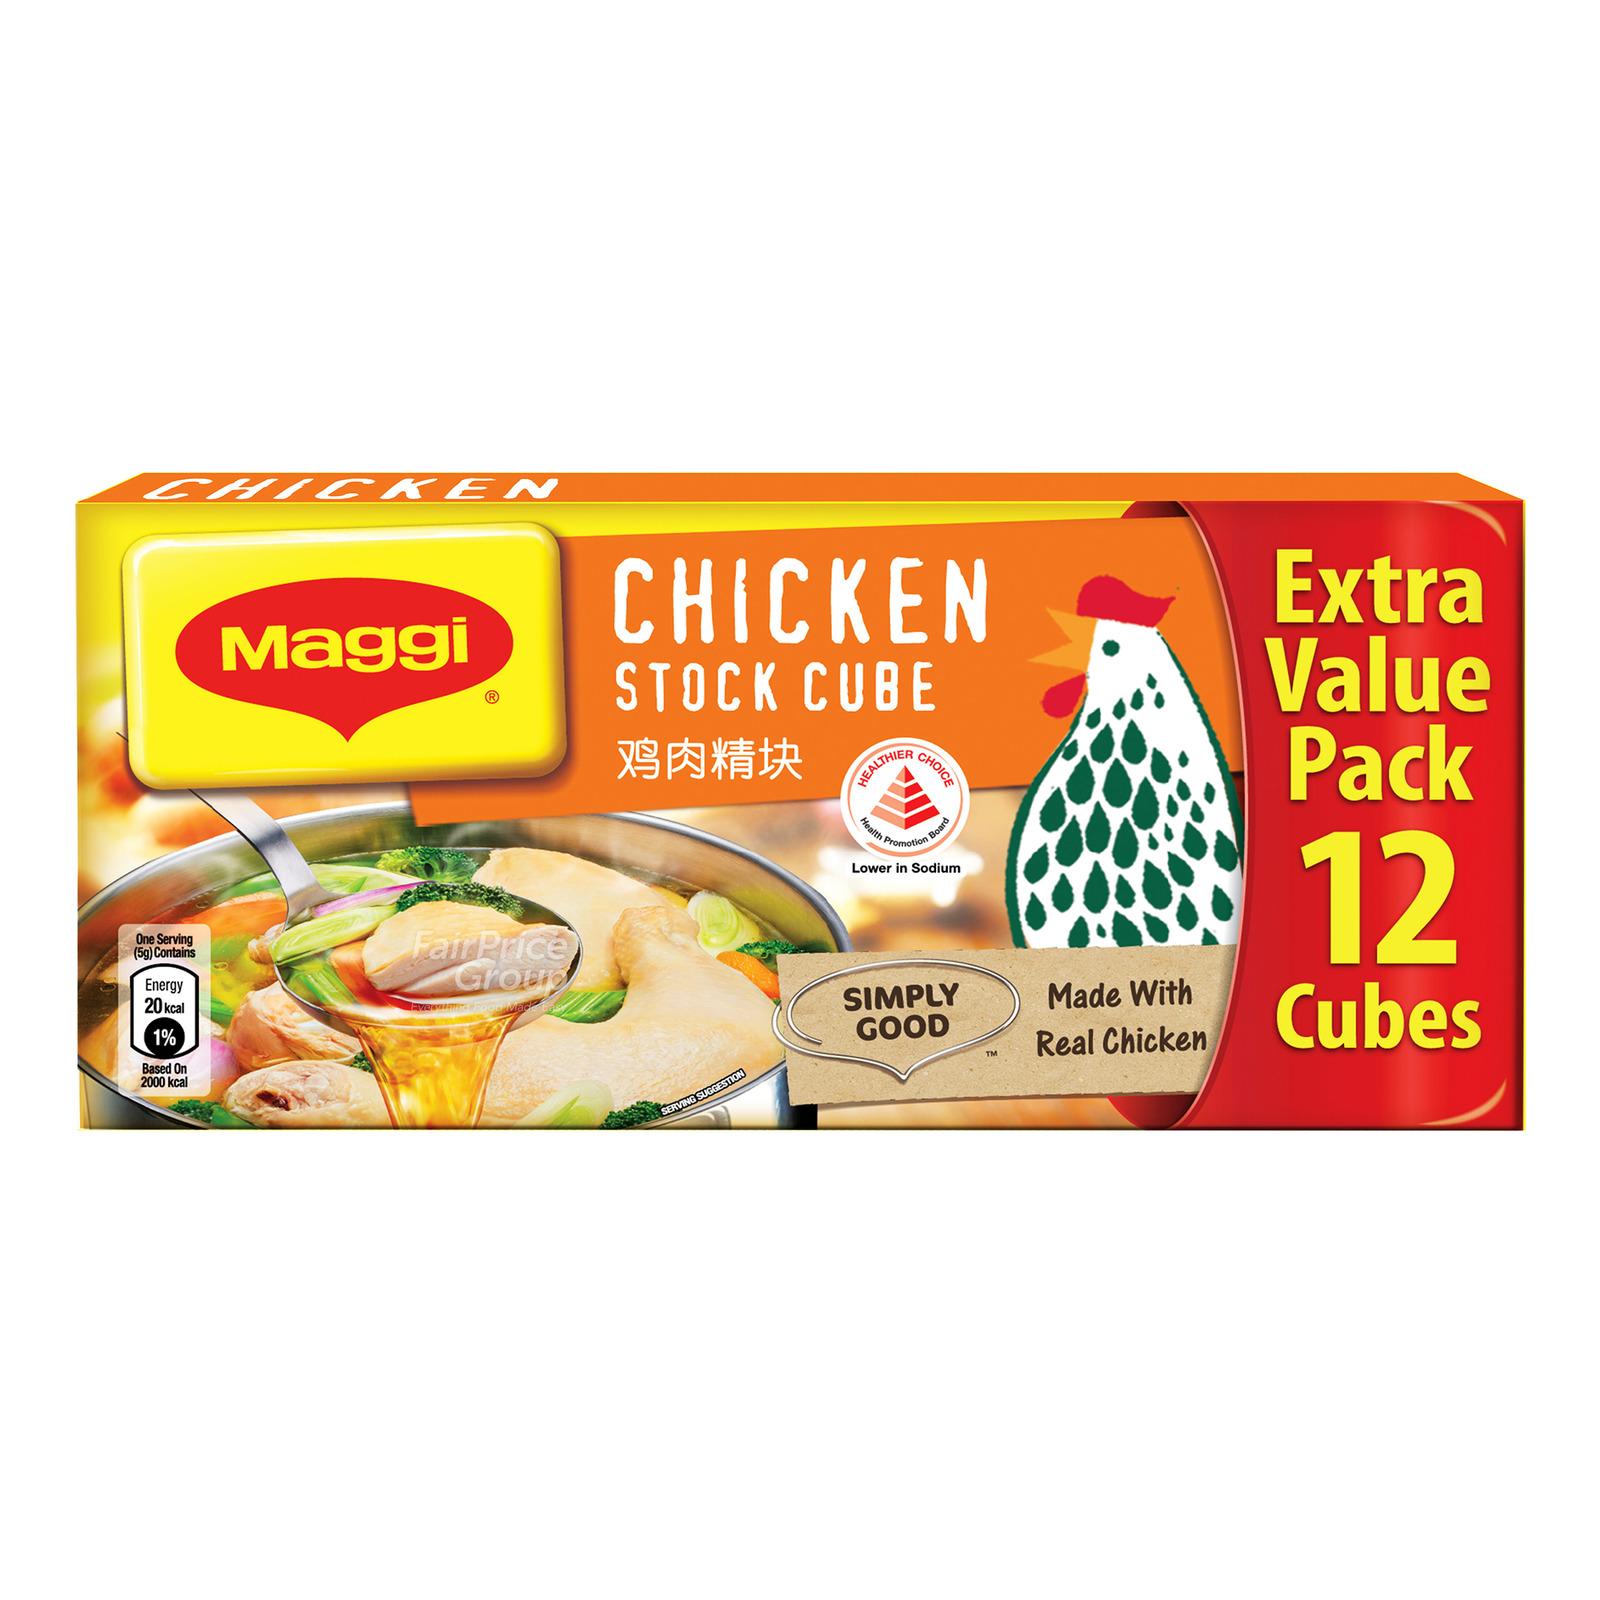 Maggi Chicken Stock Cubes Hcs 12S